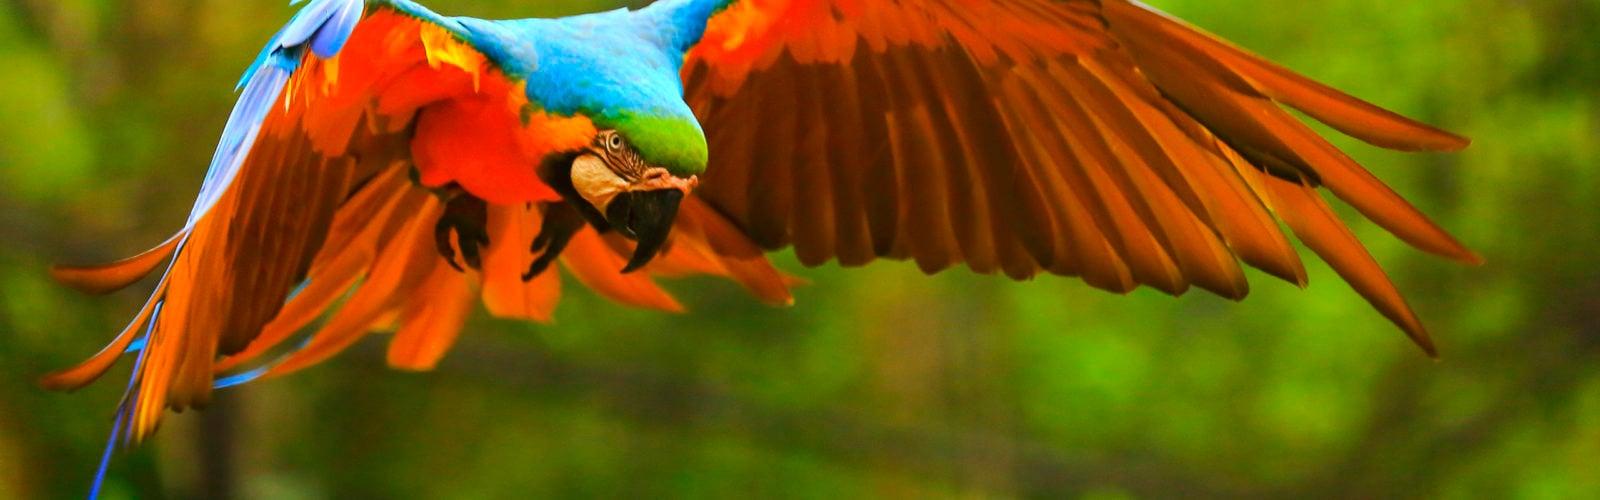 brazil-amazon-parrot